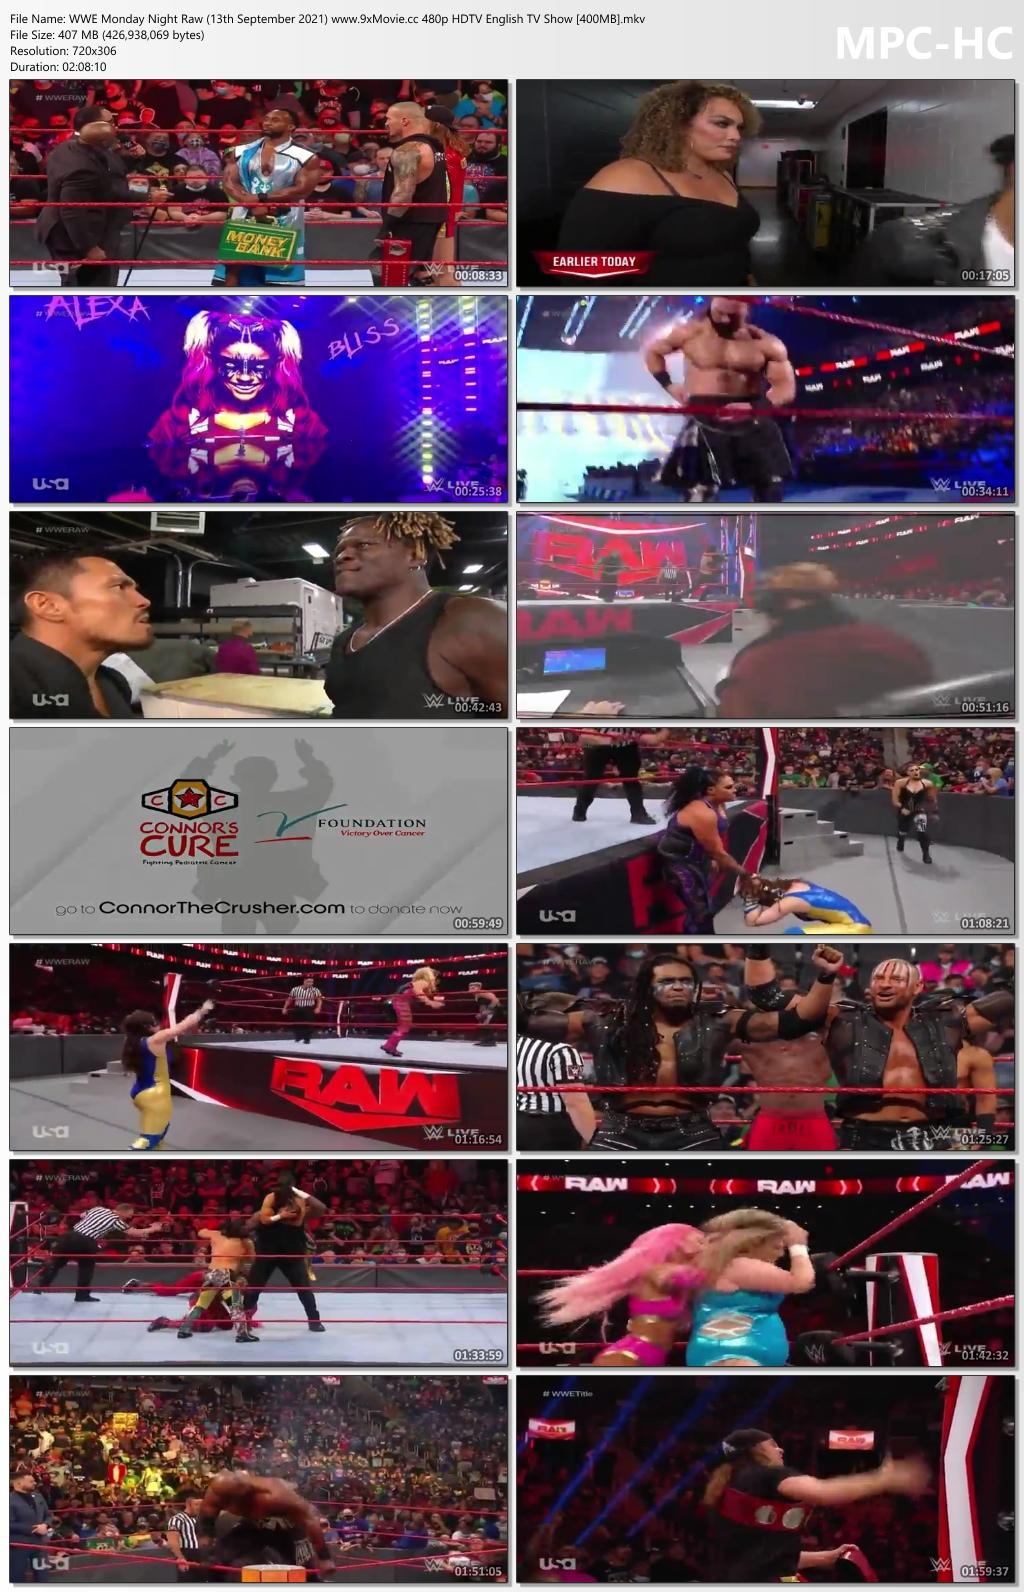 WWE-Monday-Night-Raw-13th-September-2021-www-9x-Movie-cc-480p-HDTV-English-TV-Show-400-MB-mkv